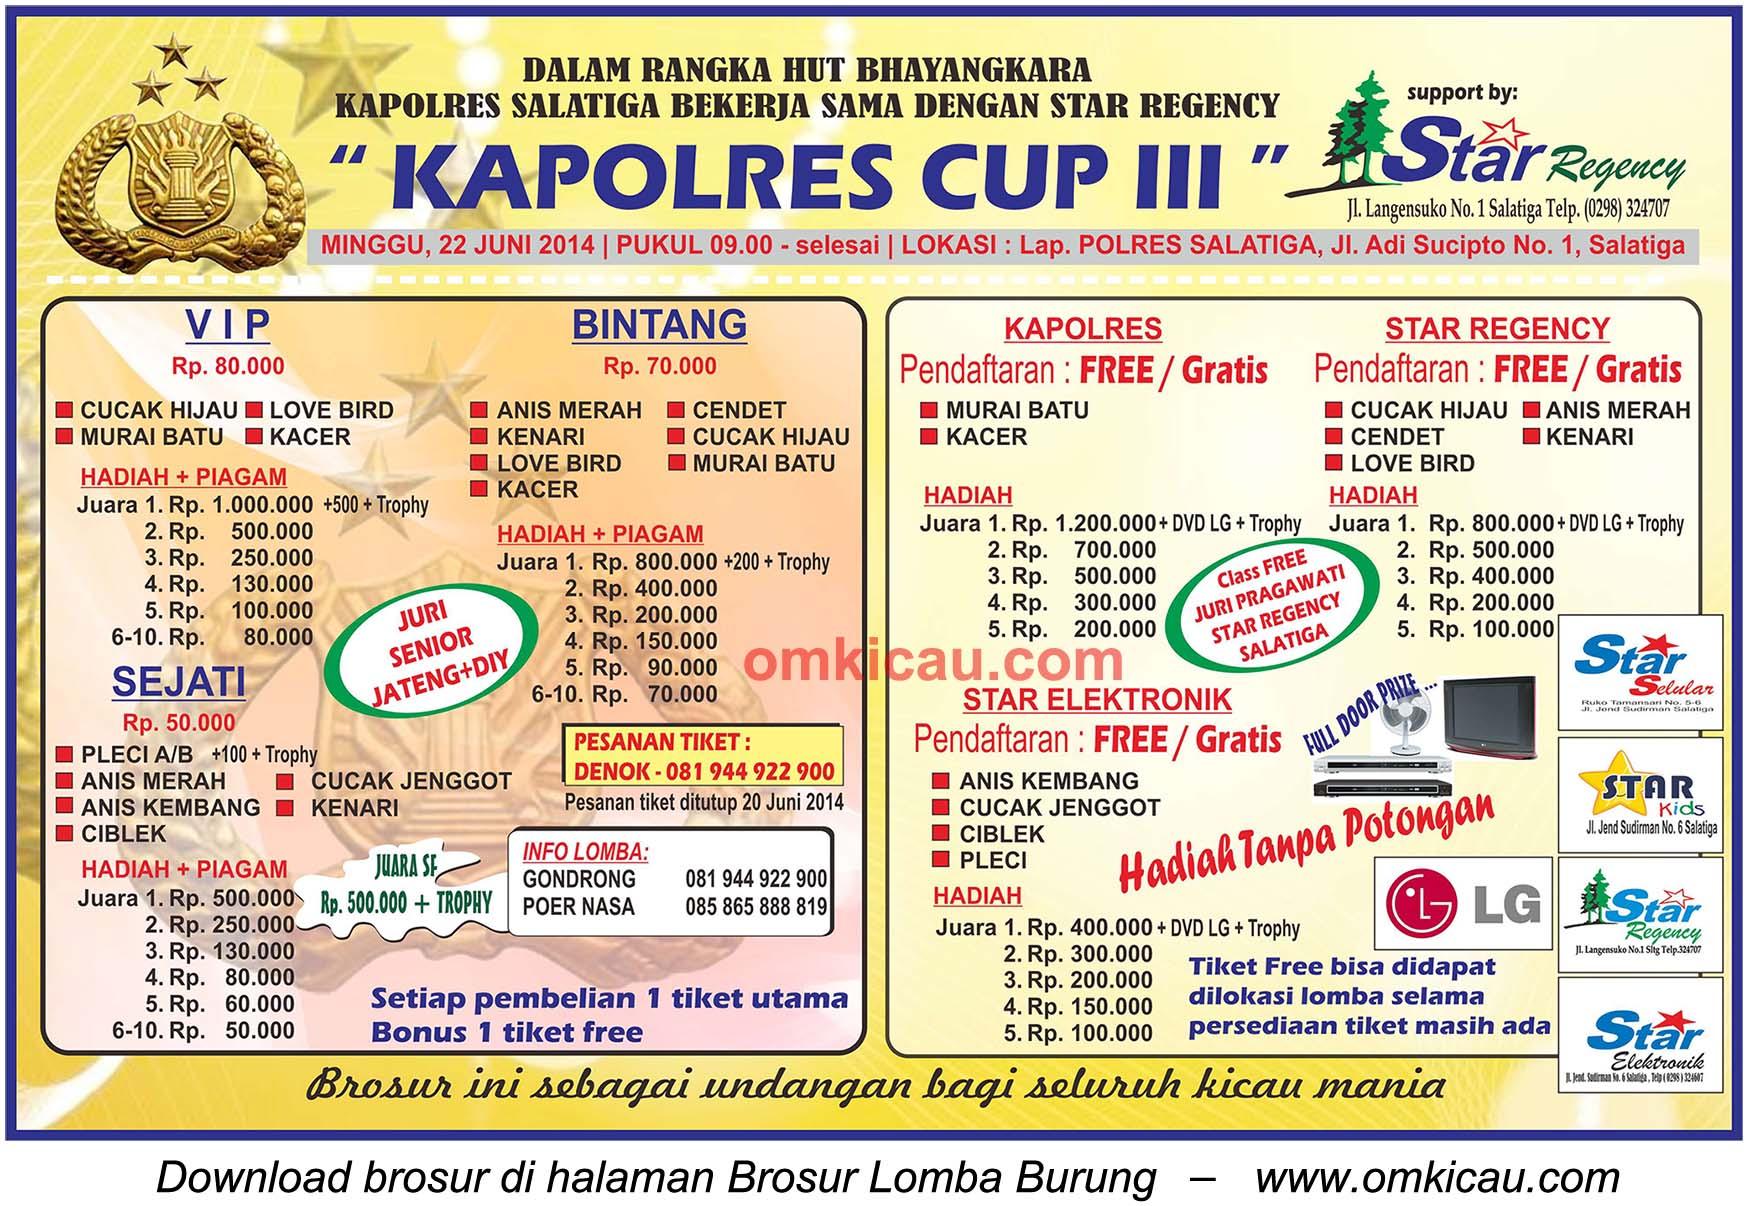 Brosur Lomba Burung Berkicau Kapolres Cup III, Salatiga, 22 Juni 2014